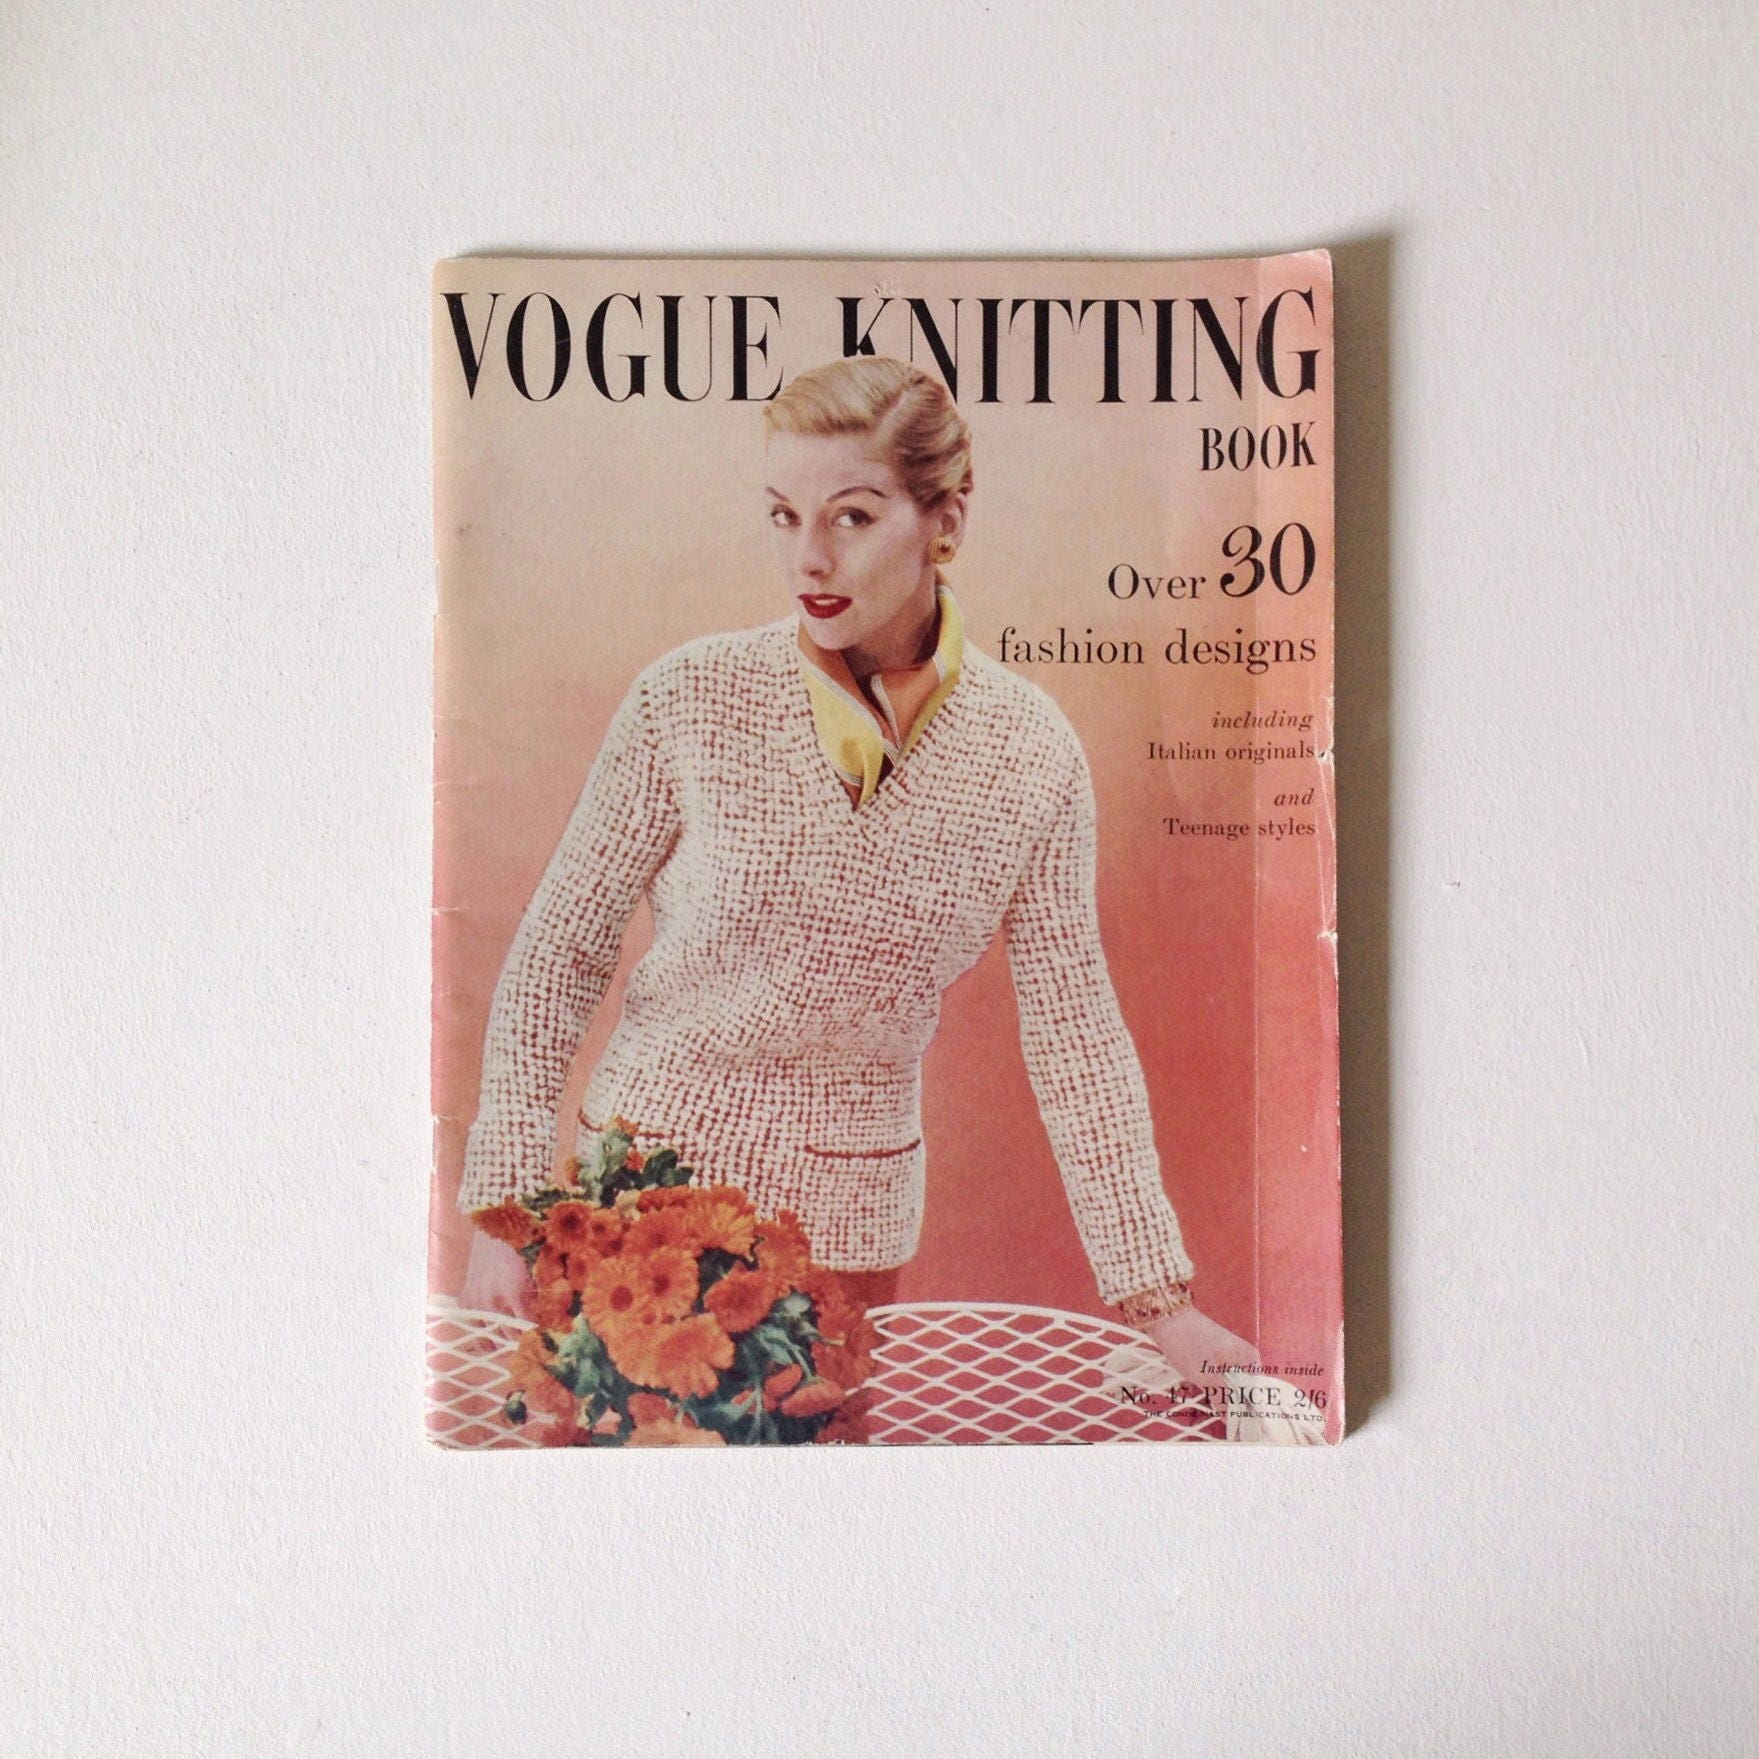 Vogue knitting autumn 1955 retro knitting pattern magazine vogue knitting autumn 1955 retro knitting pattern magazine vintage vogue knitting 47 1950s vogue bankloansurffo Choice Image